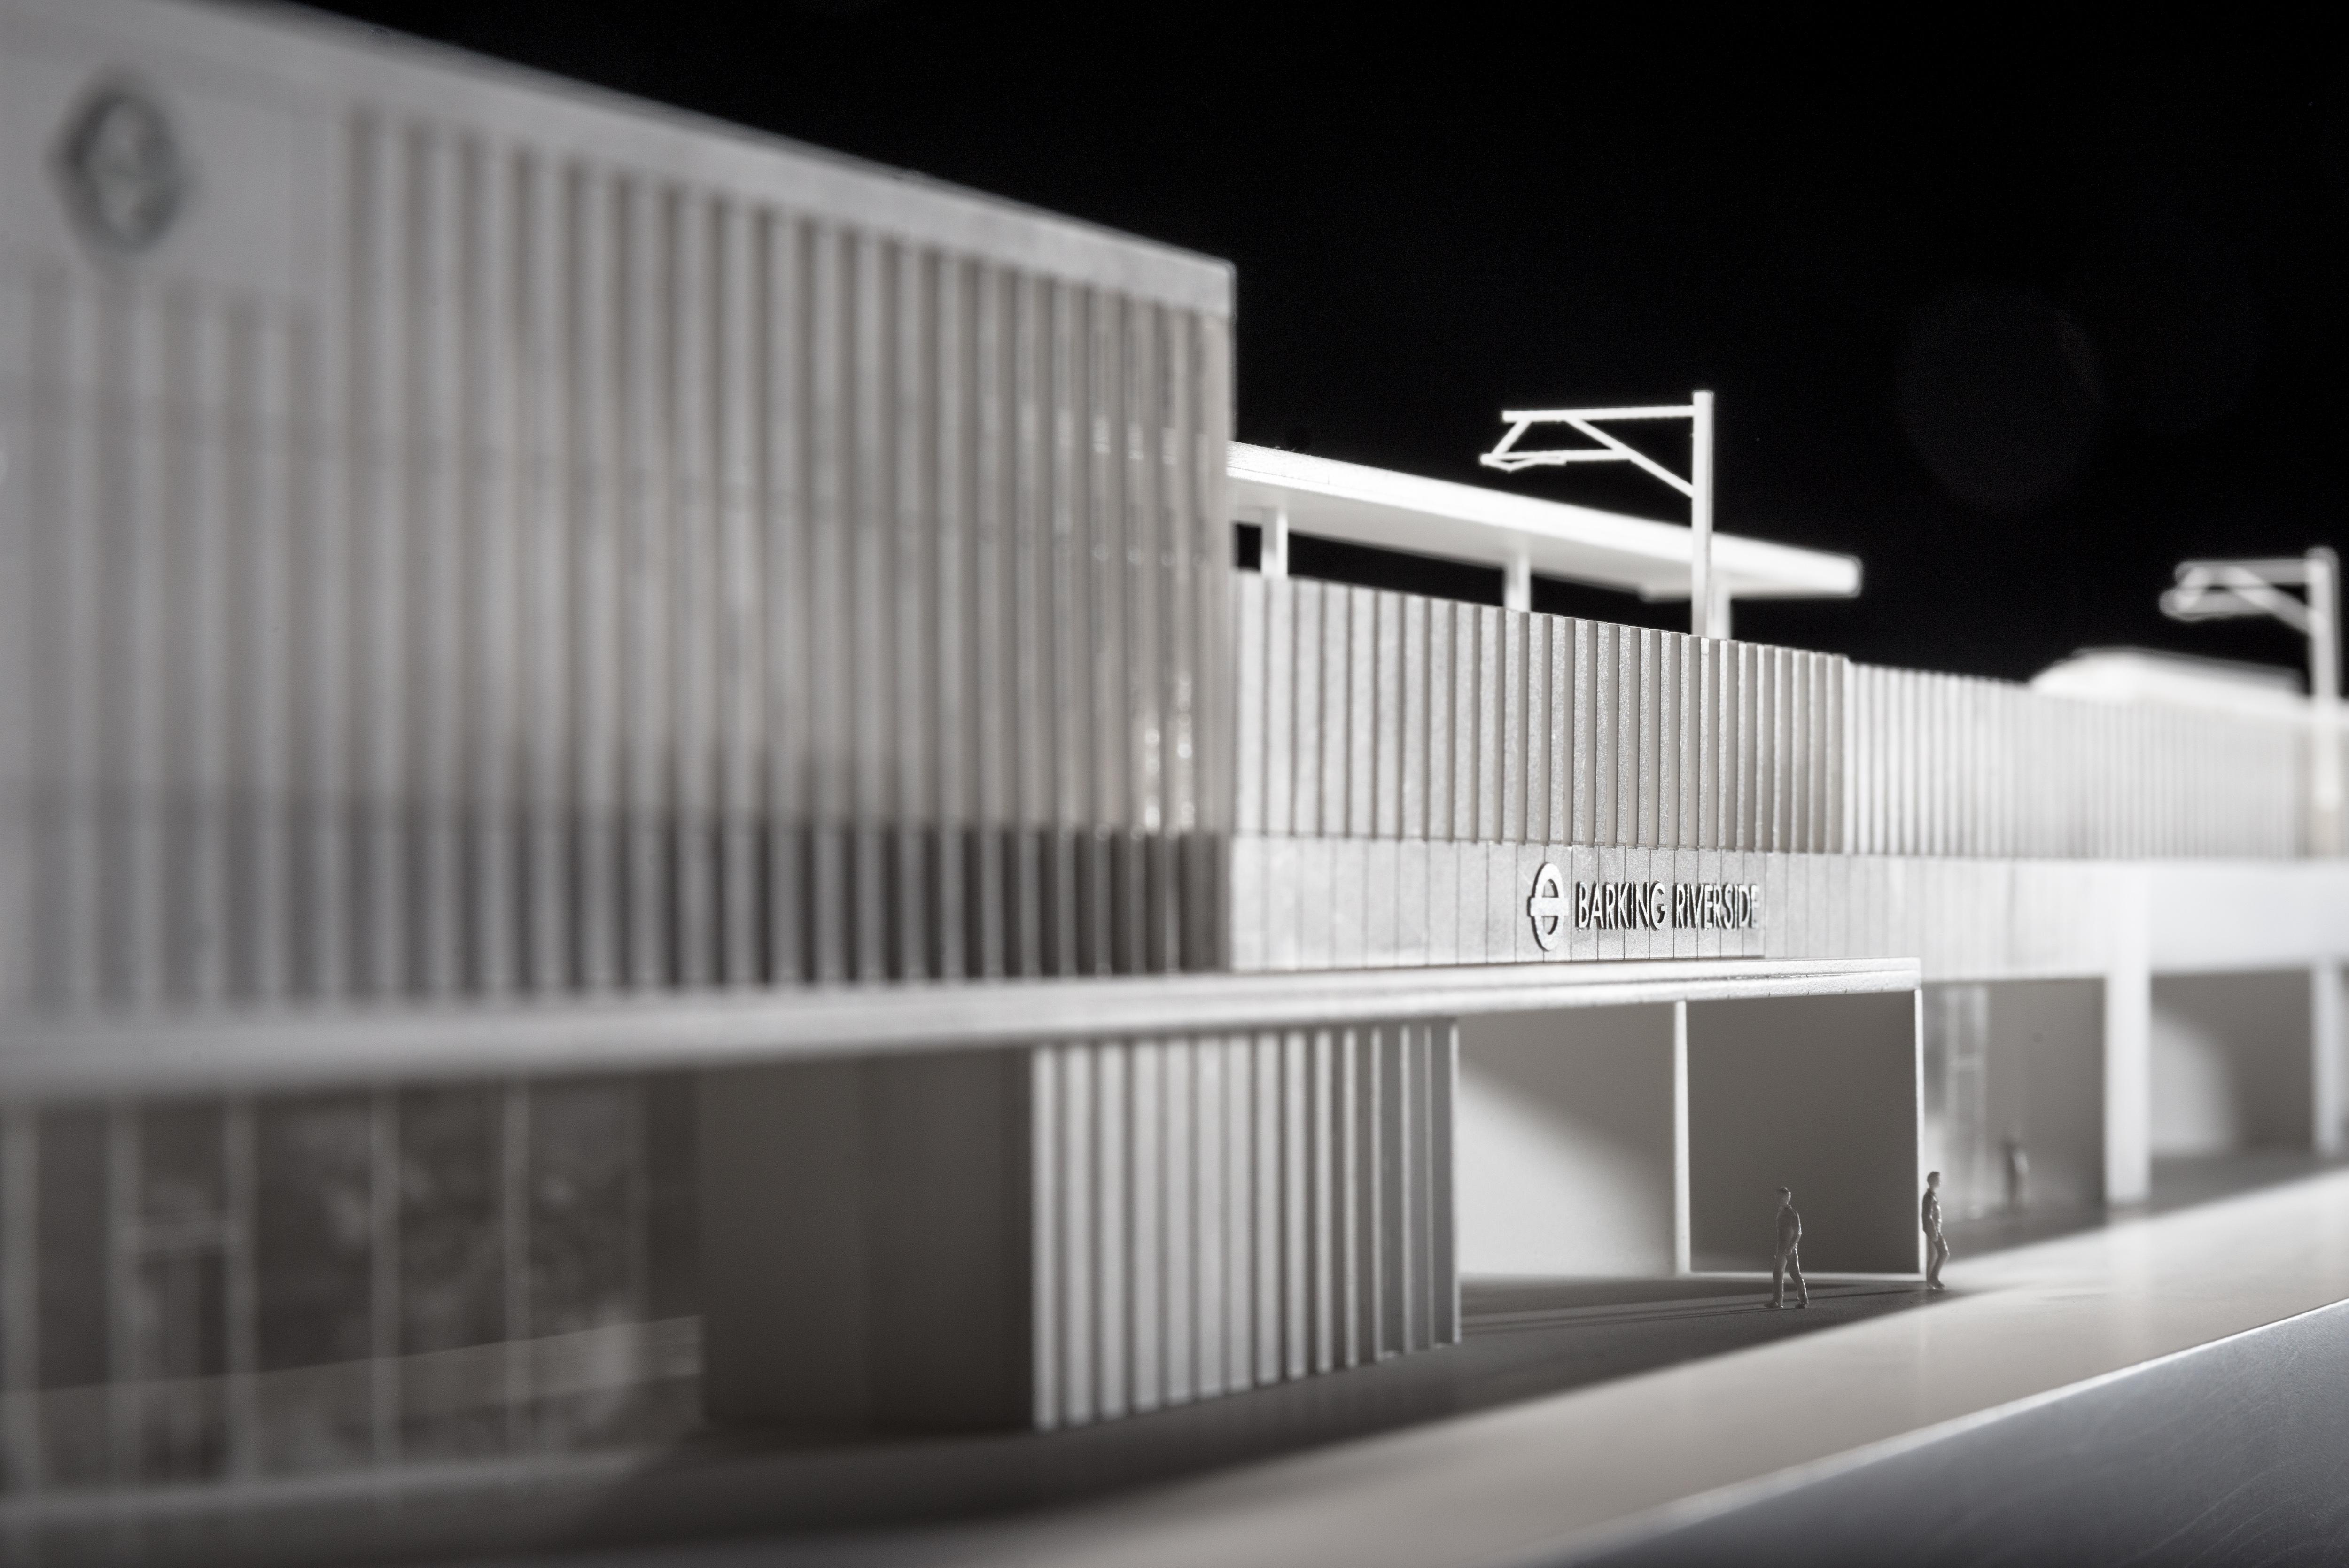 Barking Riverside station door Moxon Architects